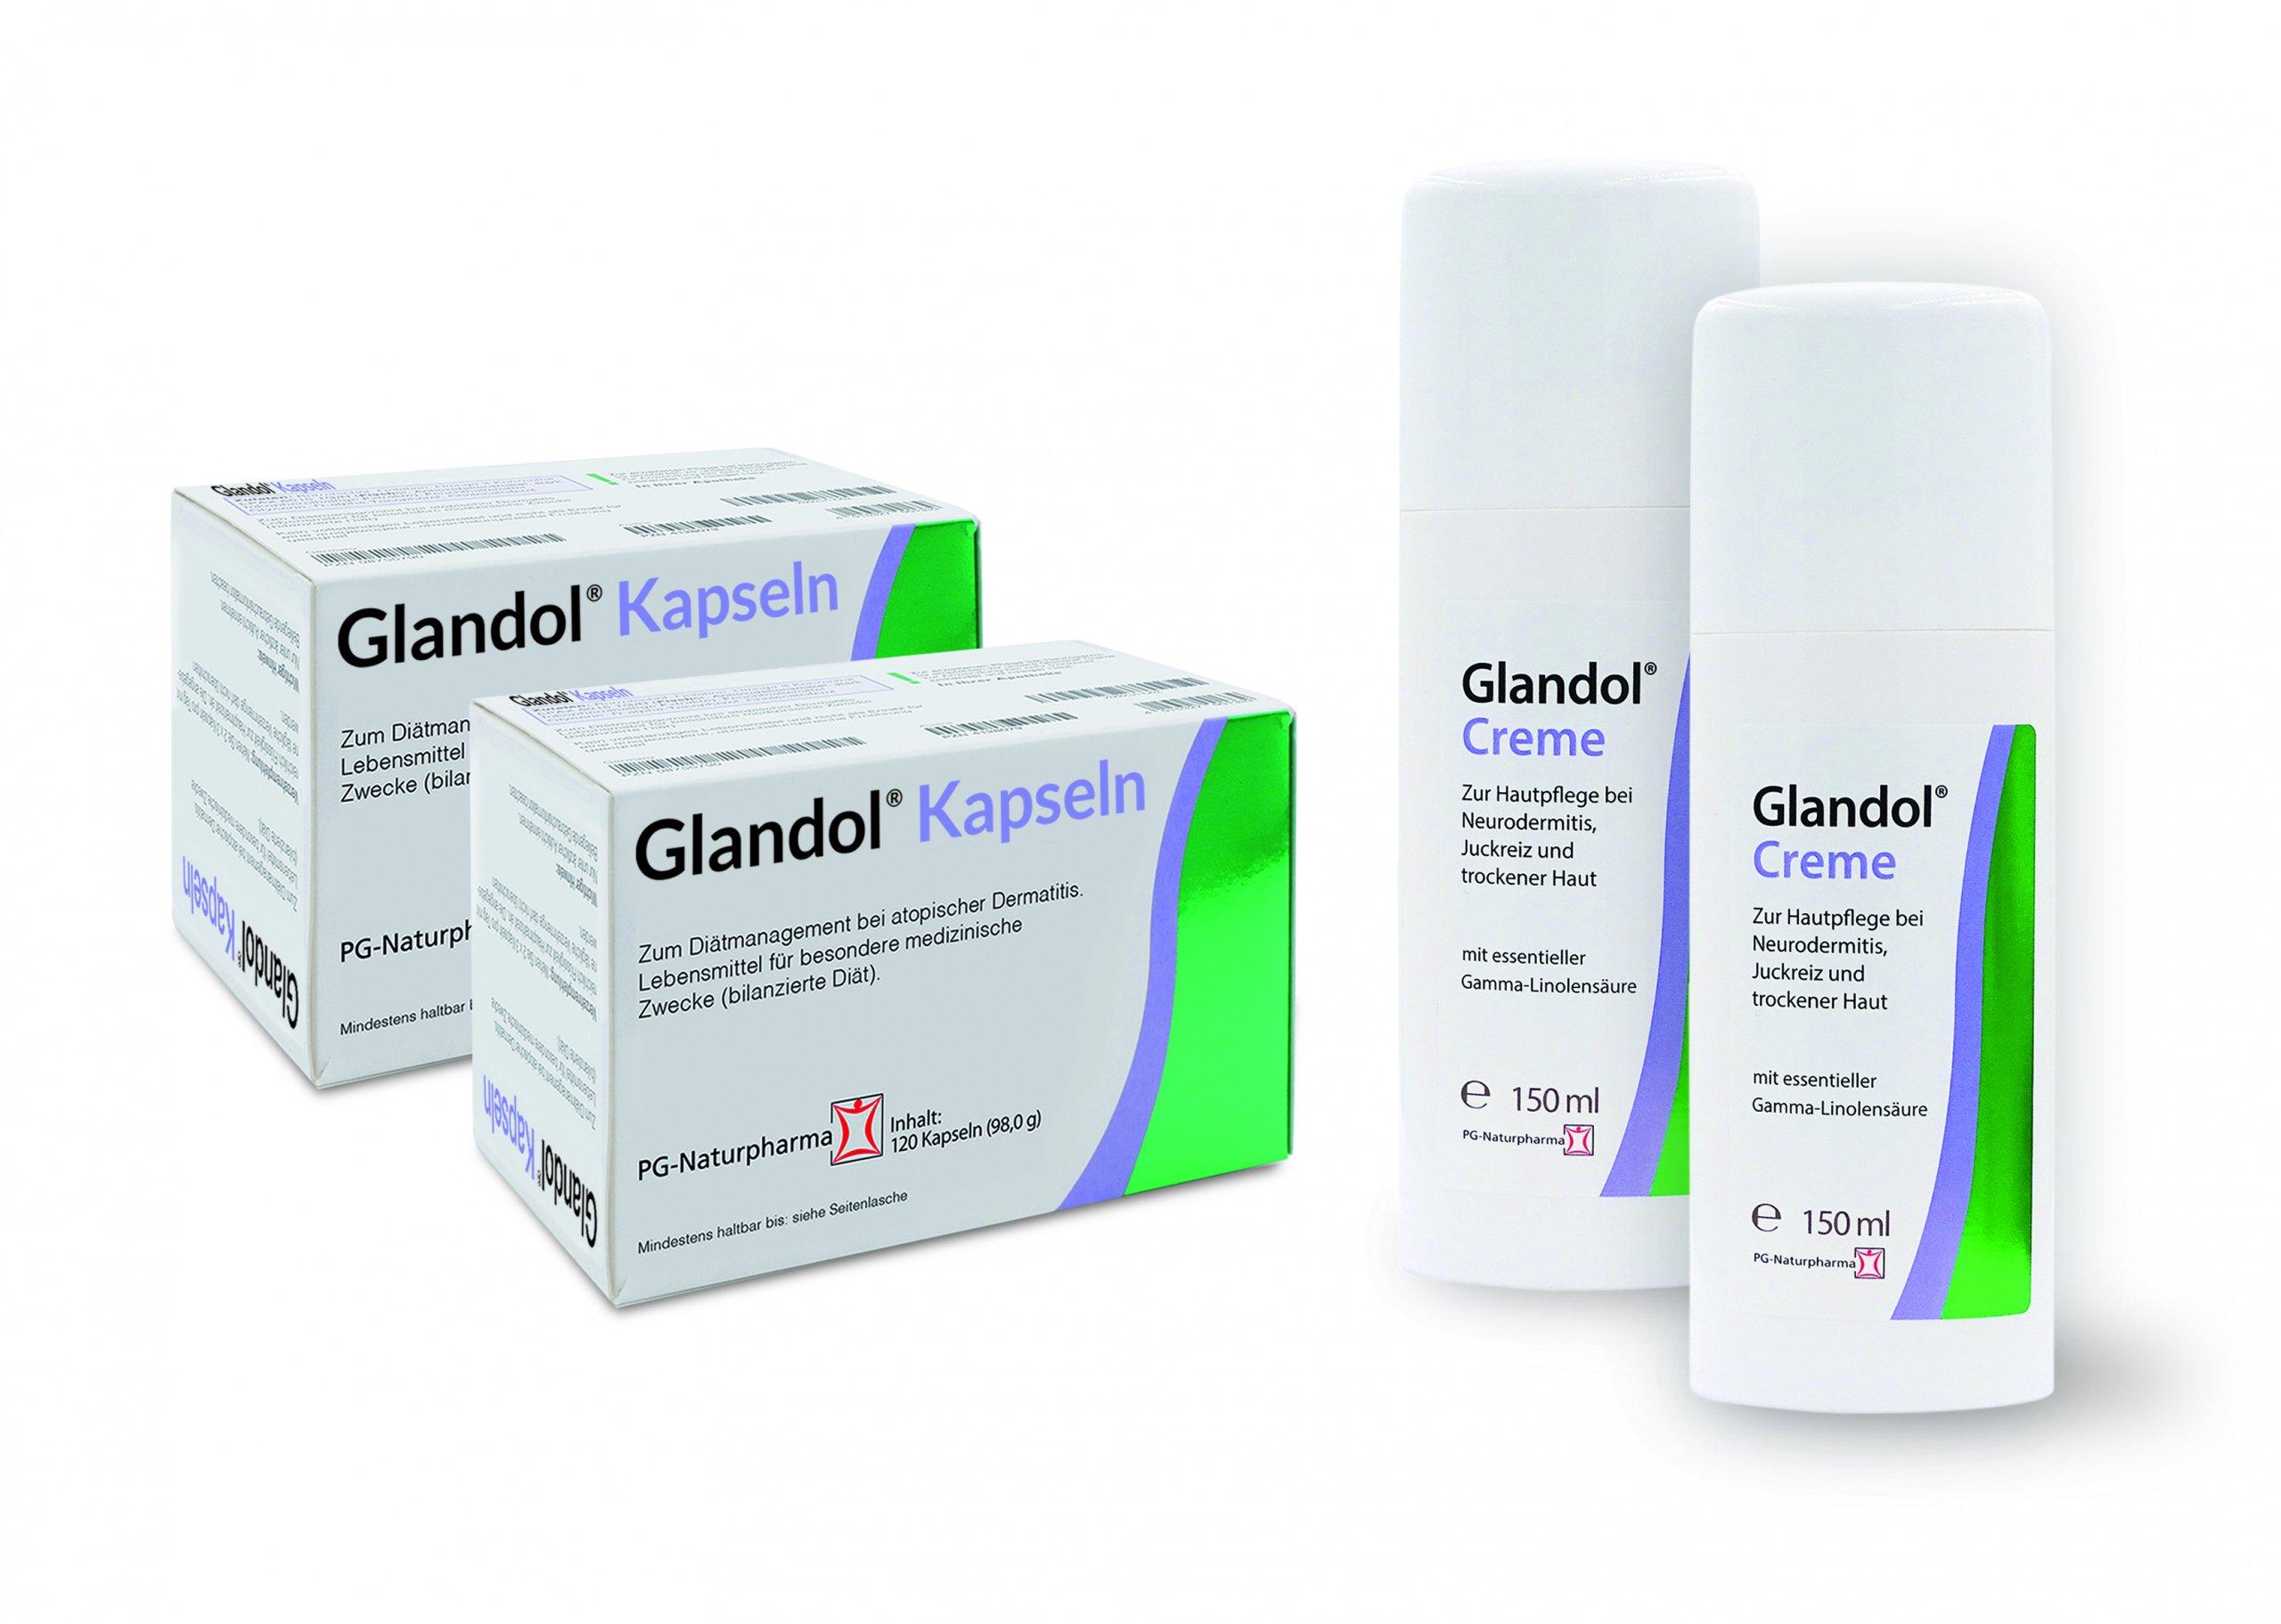 Glandol Kurpackung XL - 2x Glandol Creme 150ml & 2x Glandol Kapseln 120 Kapseln